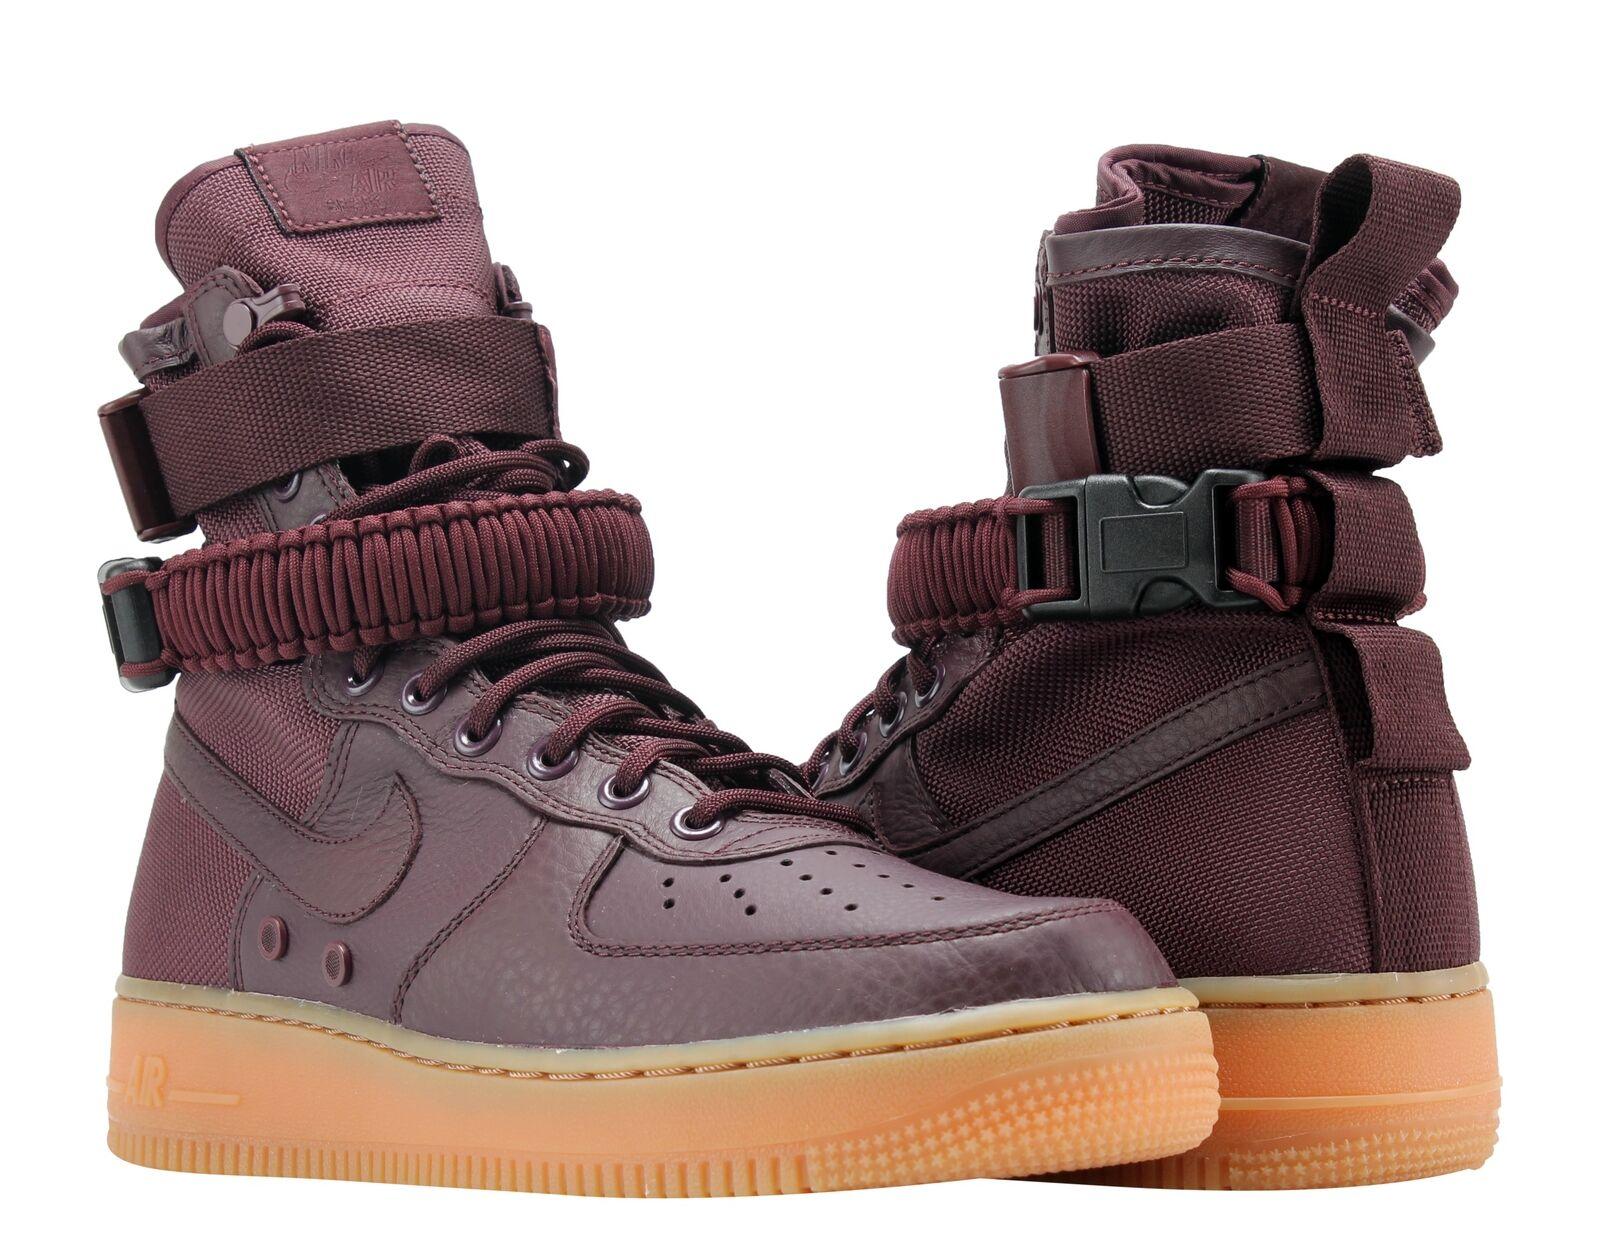 Nike SF AF1 Air Force 1 Special Forces Deep Burgundy/Gum Men's Shoes 864024-600